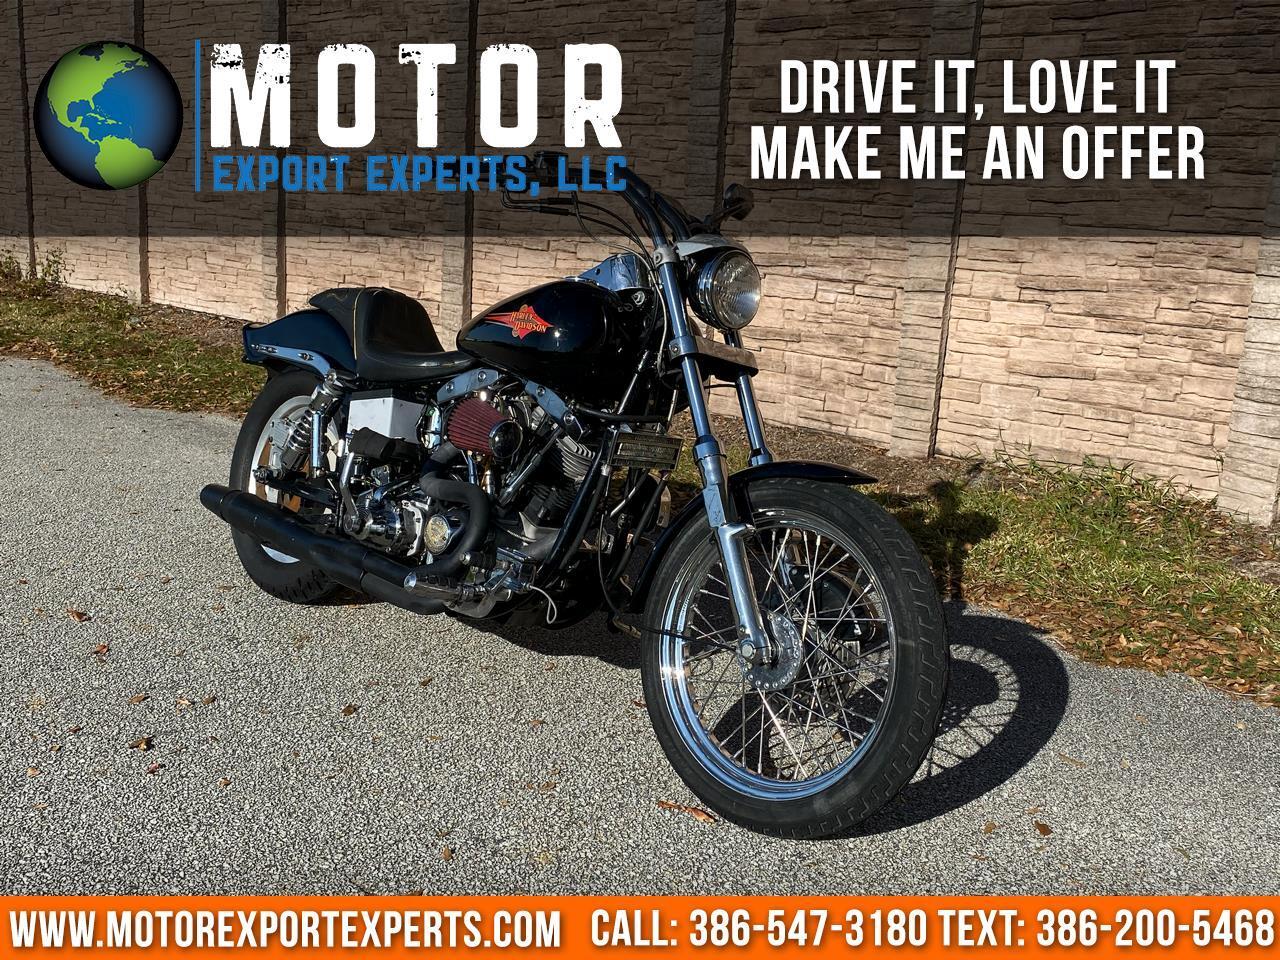 1973 Harley-Davidson FXE SUPER GLIDE